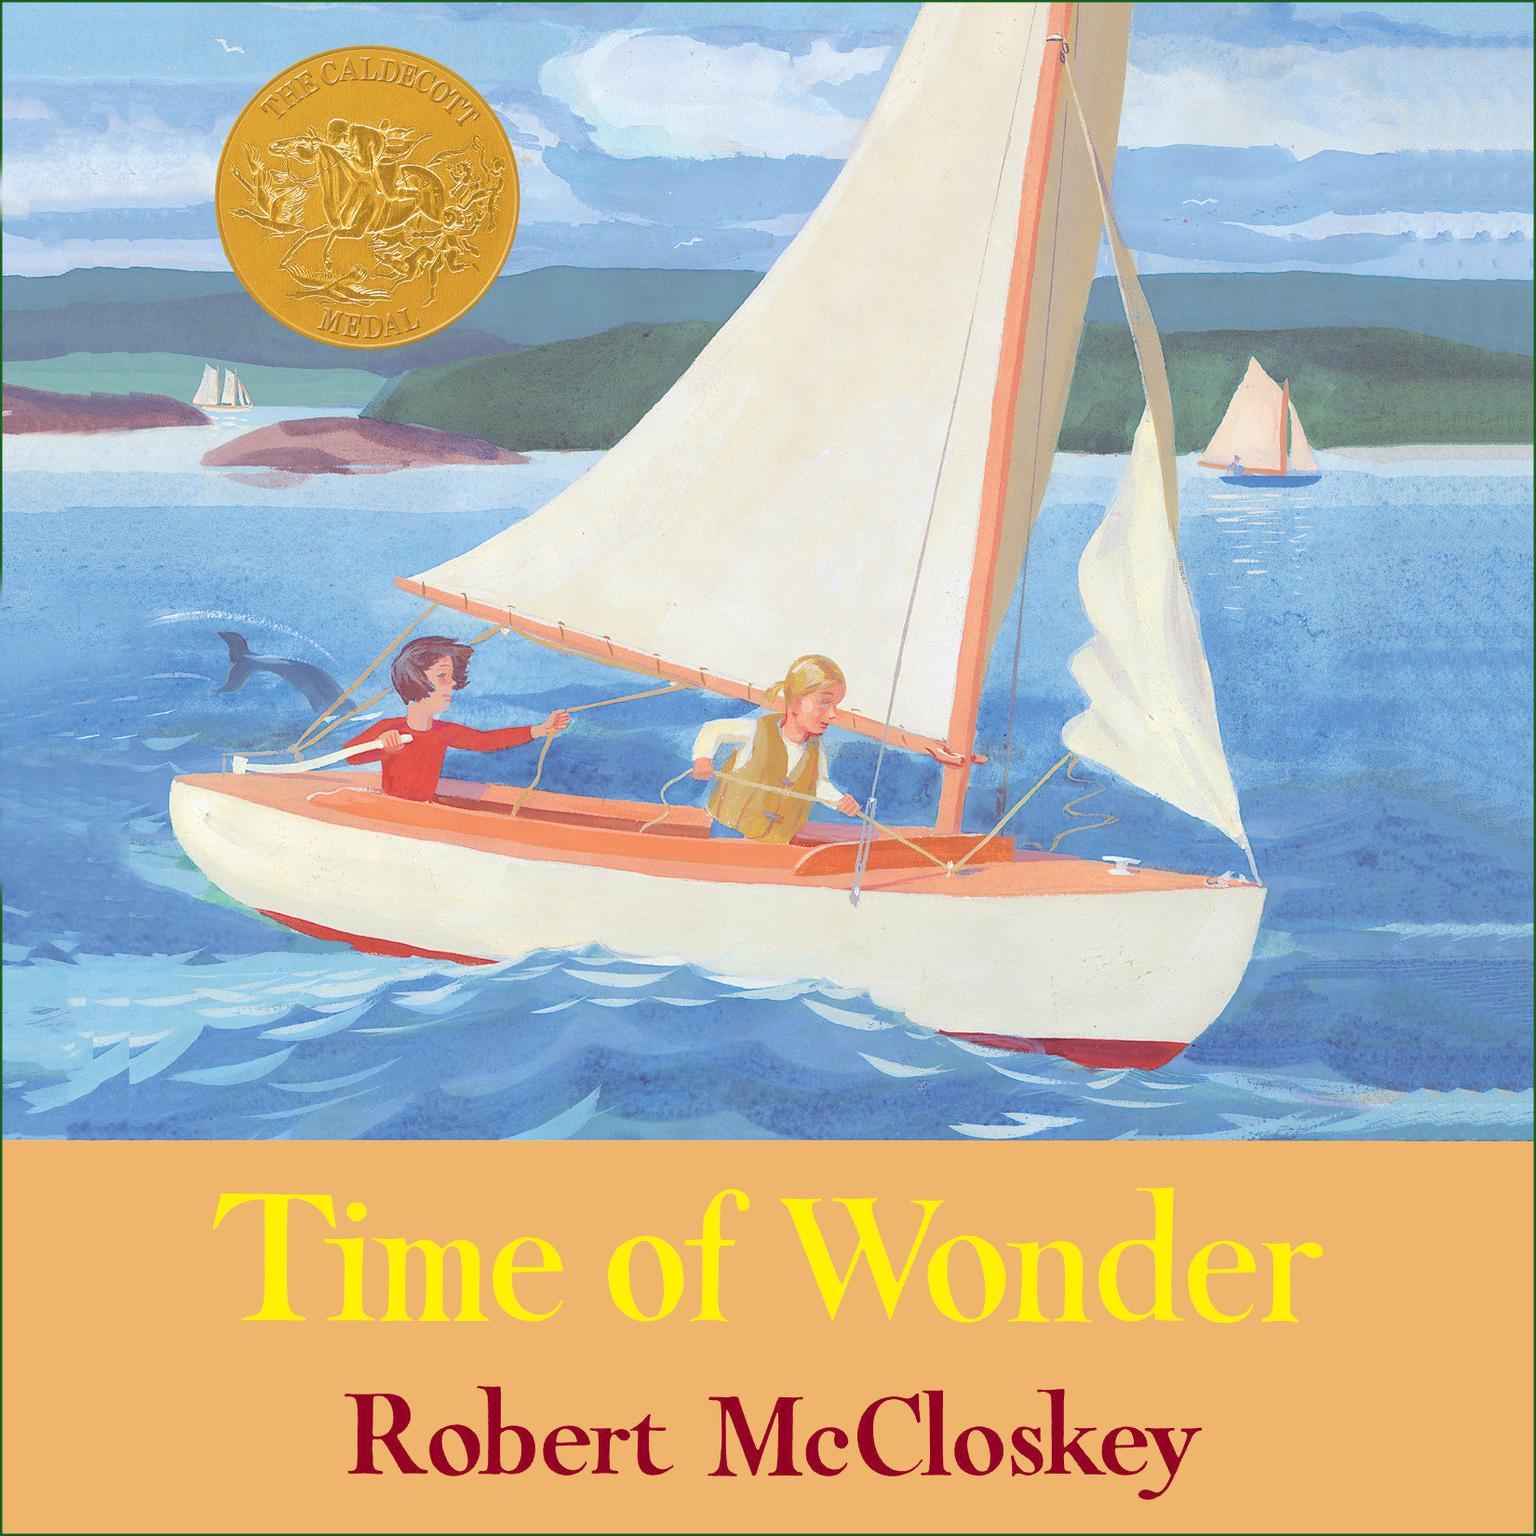 Time of Wonder Audiobook, by Robert McCloskey